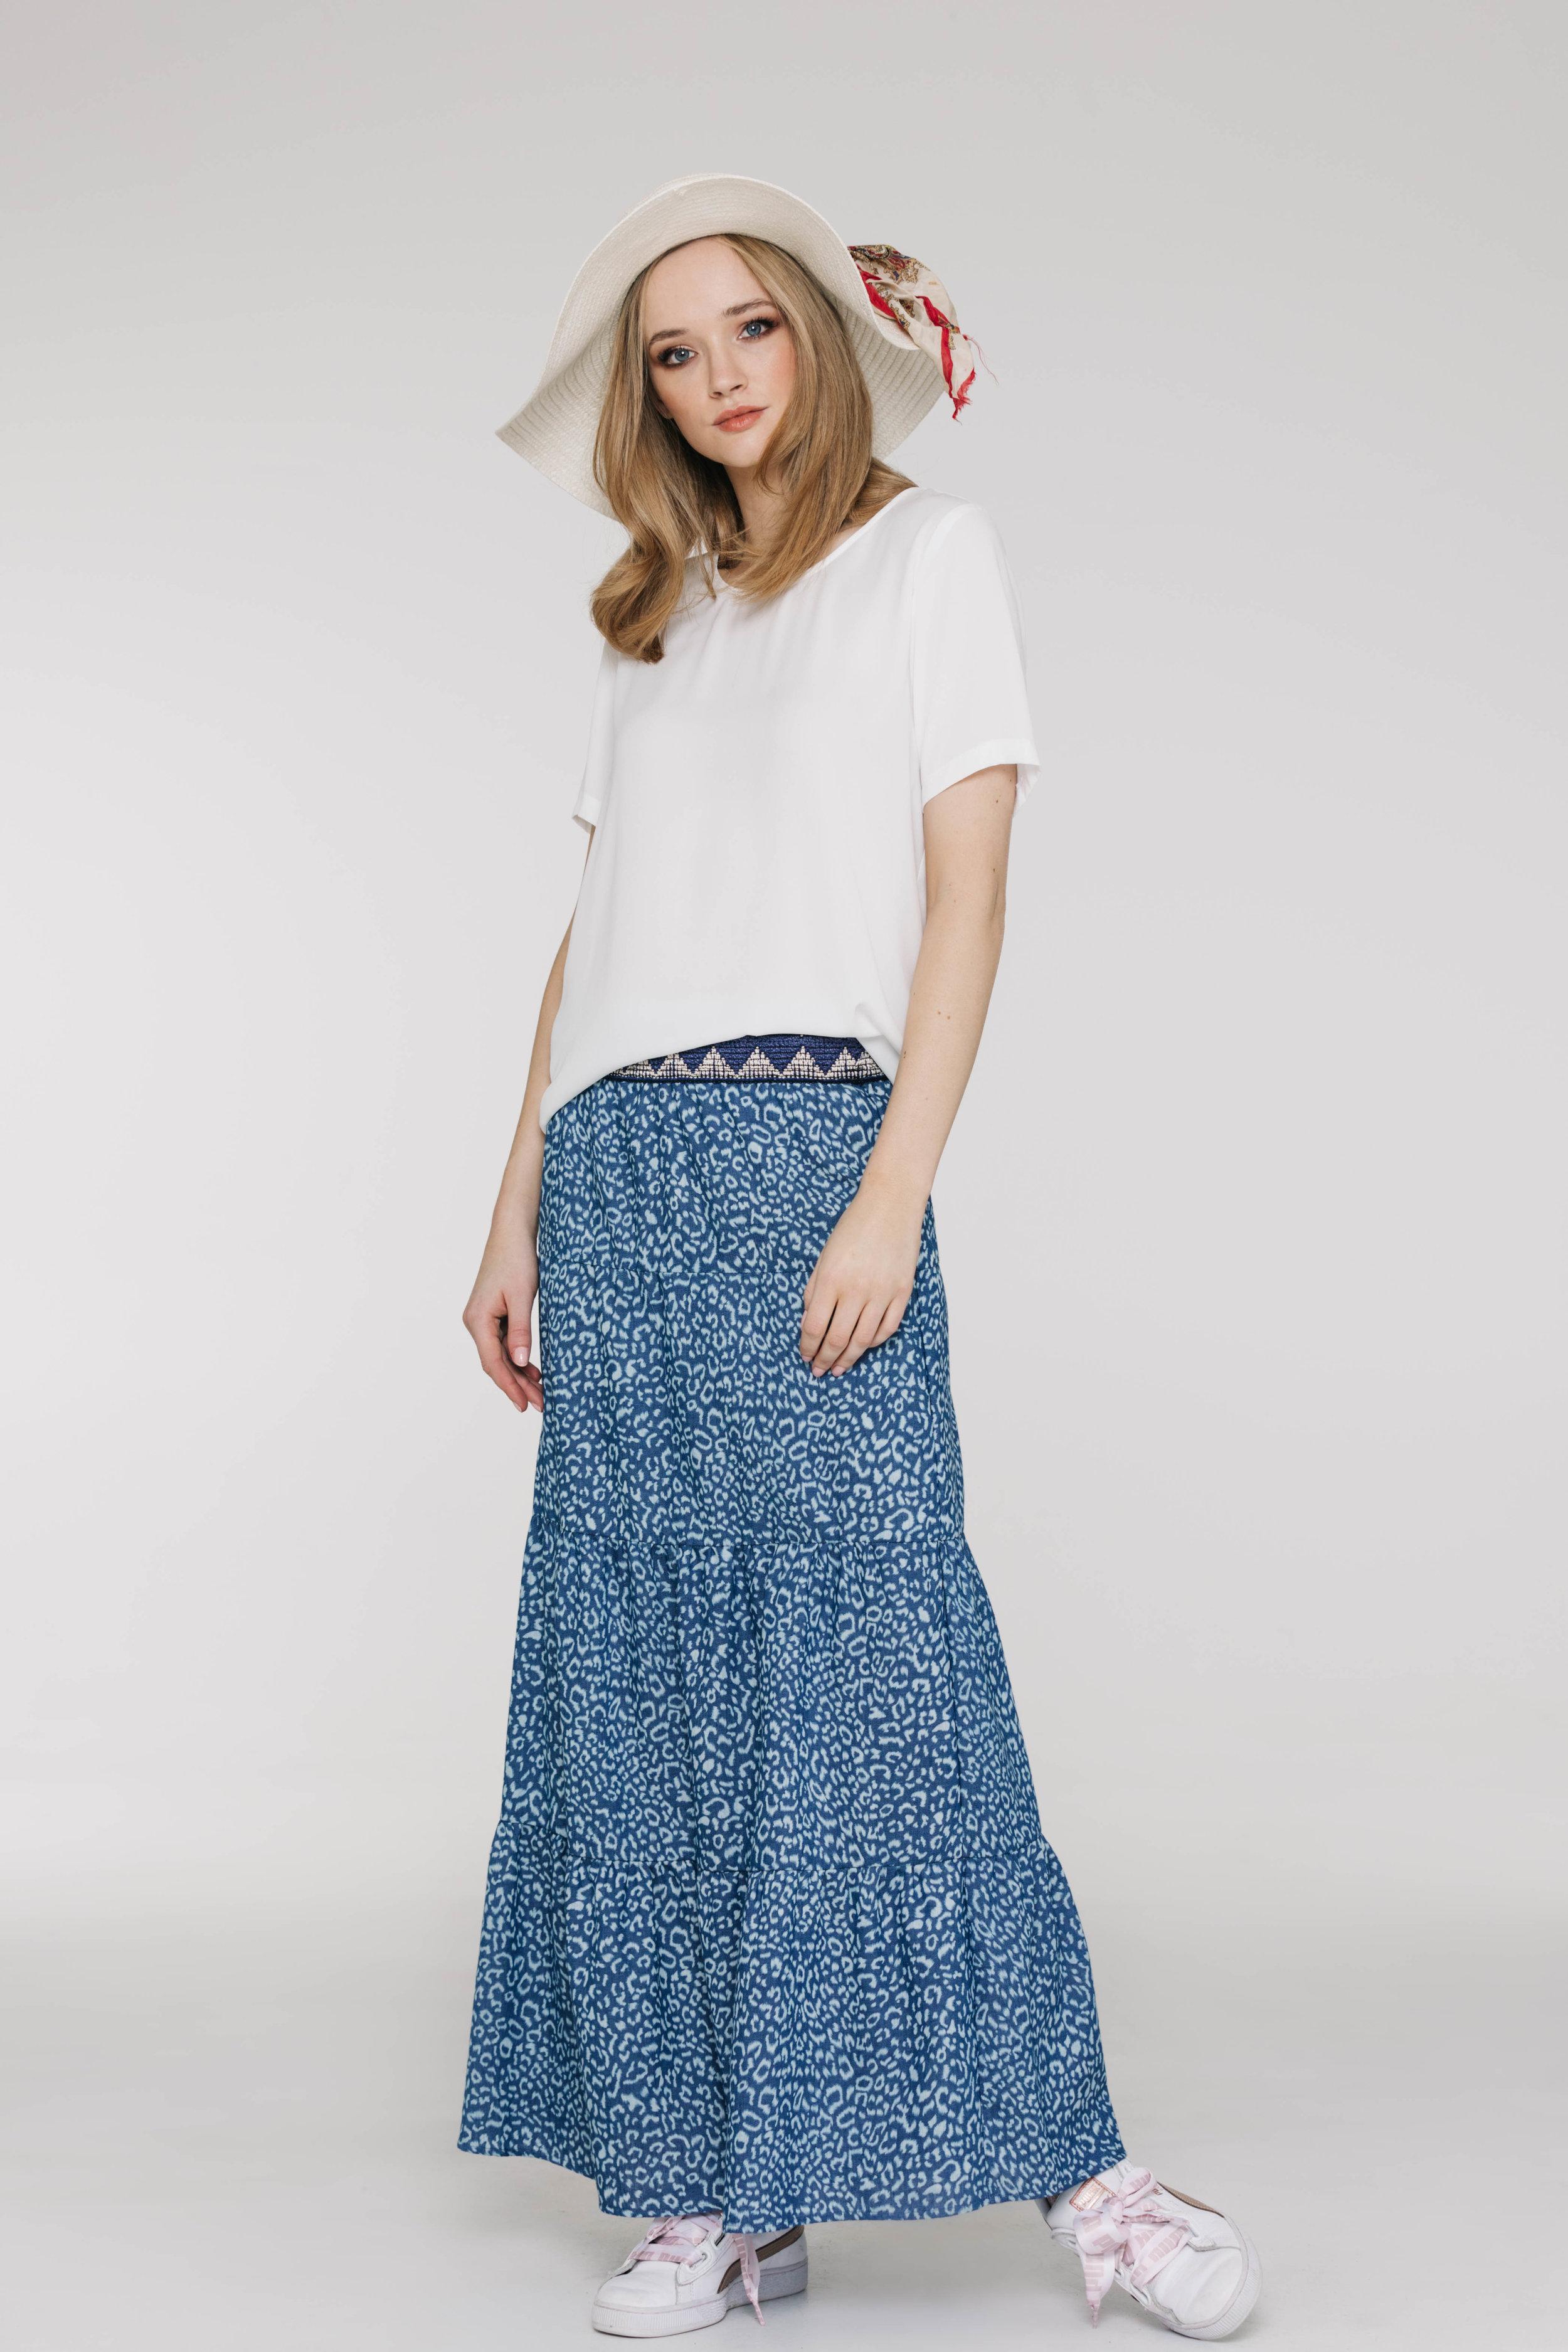 New Tux Tee 5173PA Ivory, Dolly Skirt 6519N Skin Denim